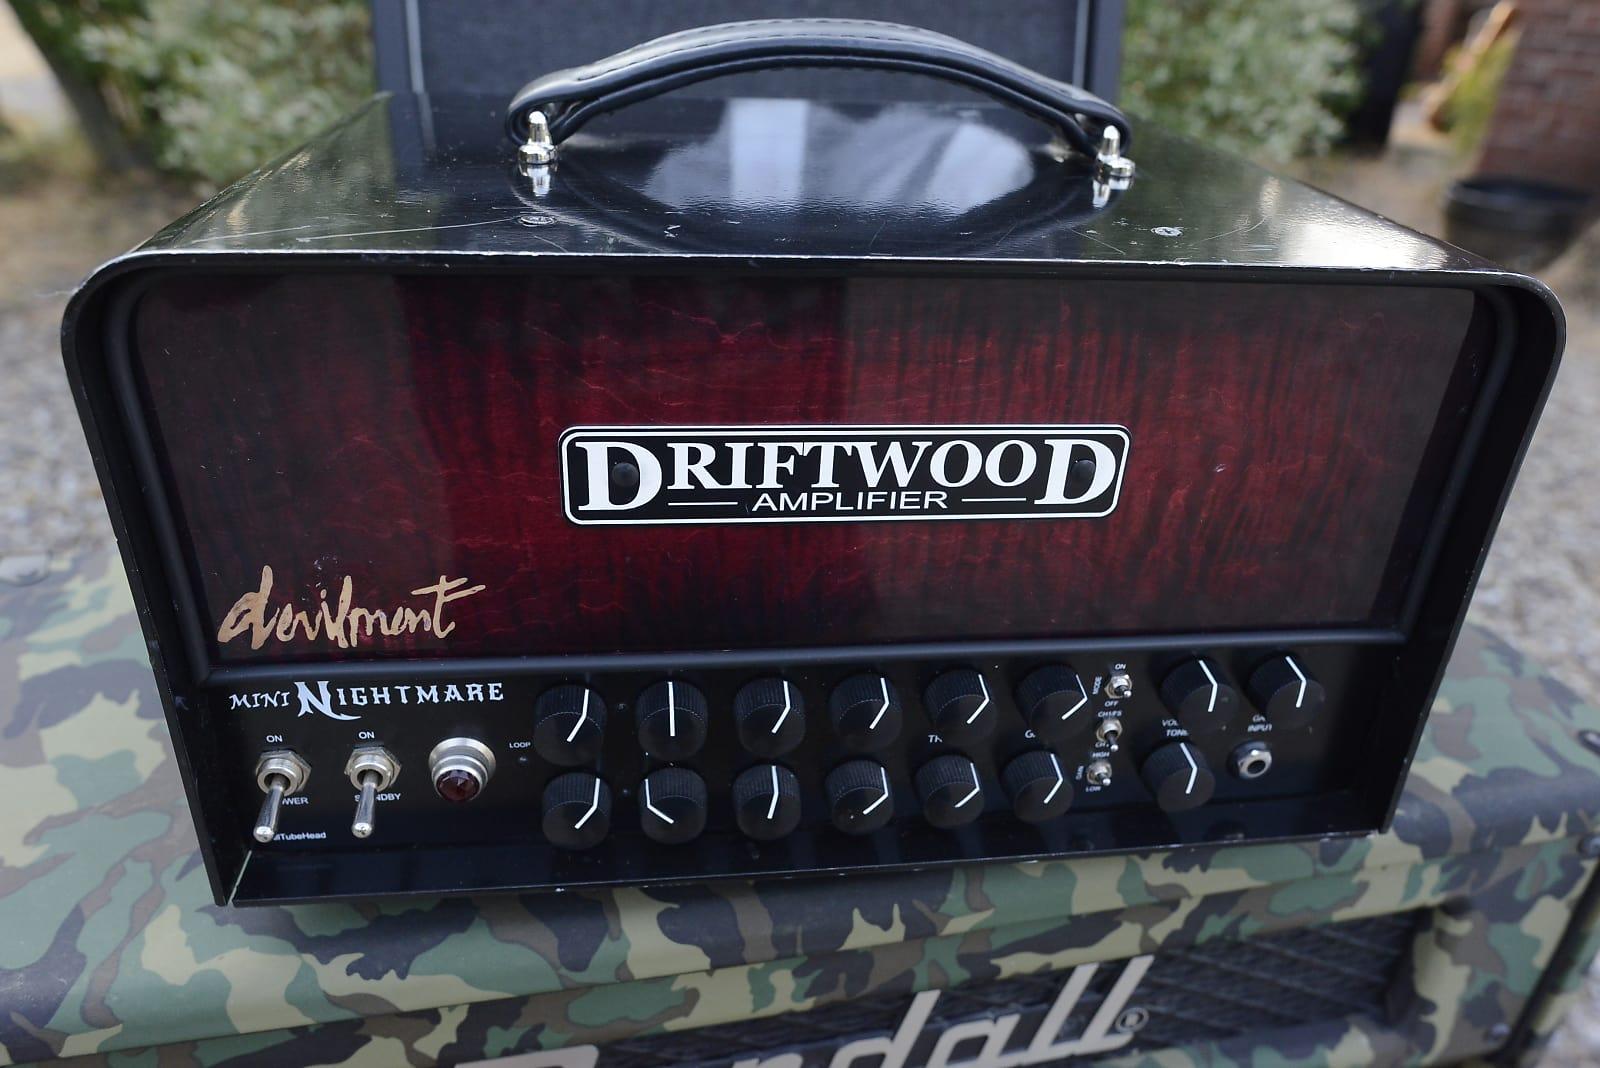 driftwood devilment artist endorsed custom mini nightmare 50 watt boutique guitar amp amplifier head. Black Bedroom Furniture Sets. Home Design Ideas